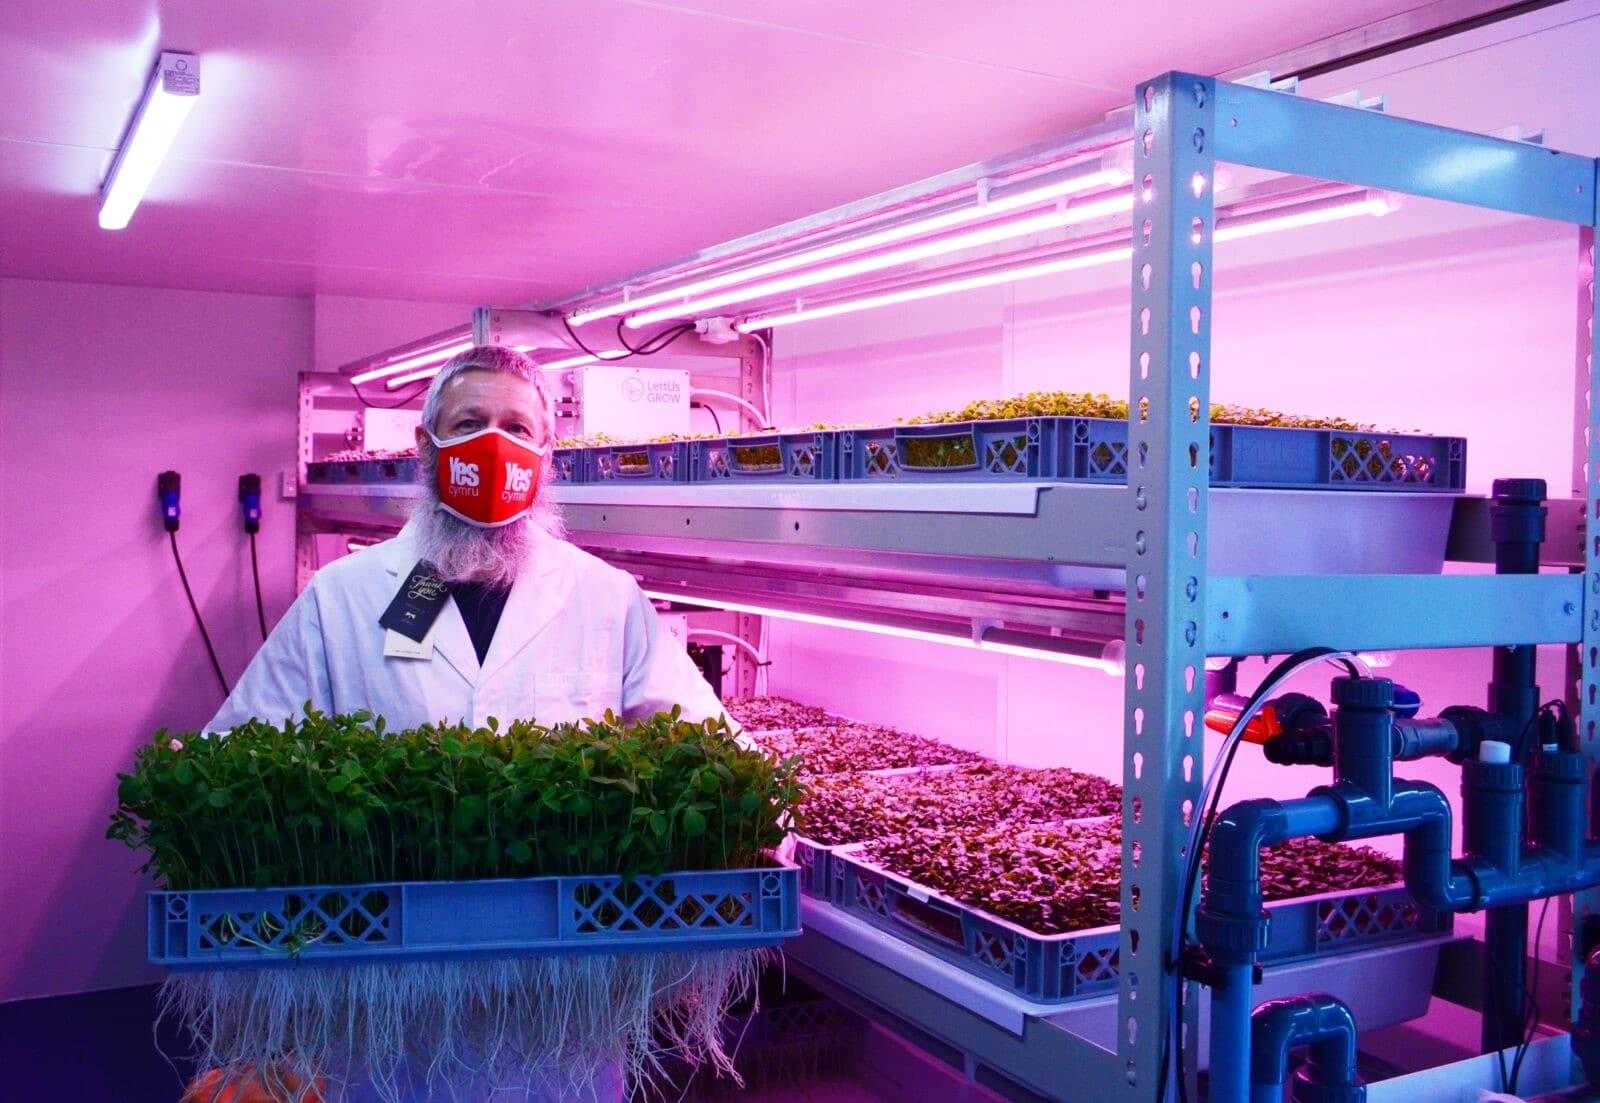 social impact vertical farming Supplied by LettUsGrow Crop Culture